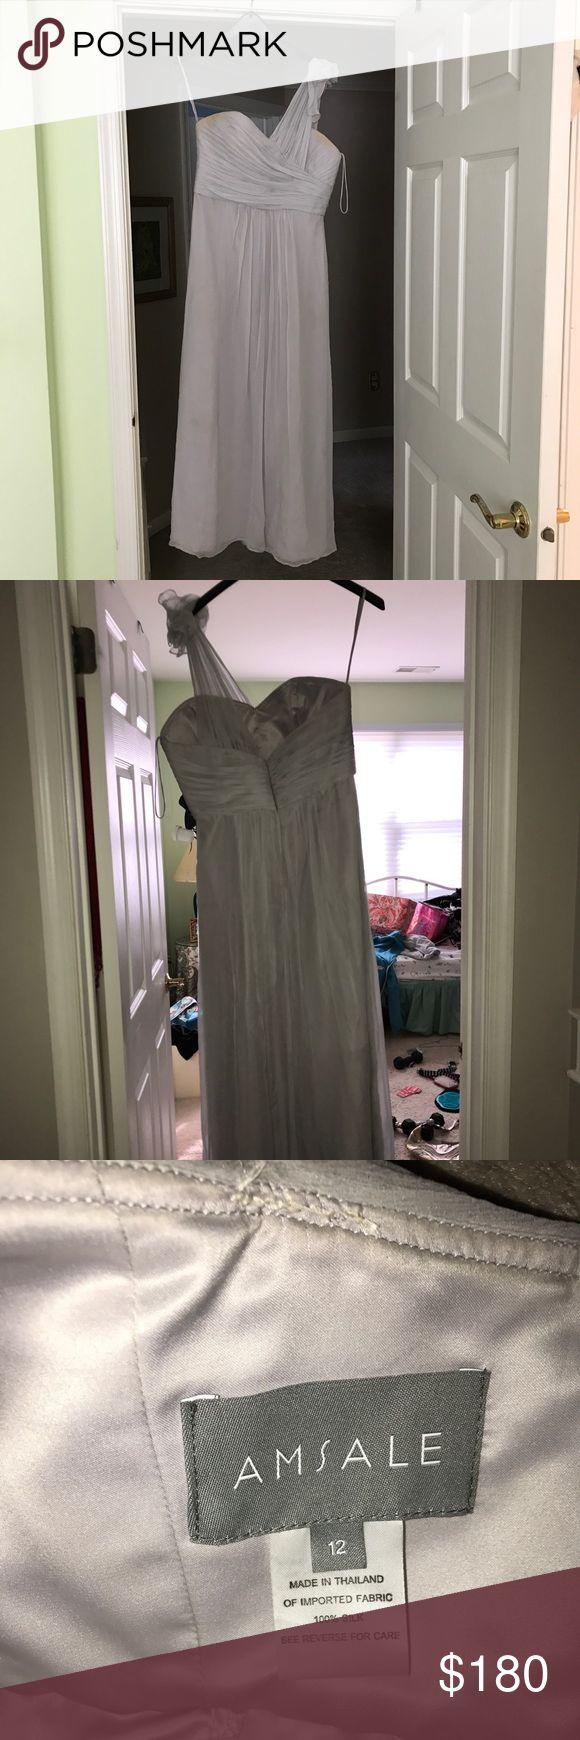 AMSALE Bridal dress size 12 PASTEL BLUE MAXI DRESS Beautiful float with lace size 12. amsale Dresses Wedding